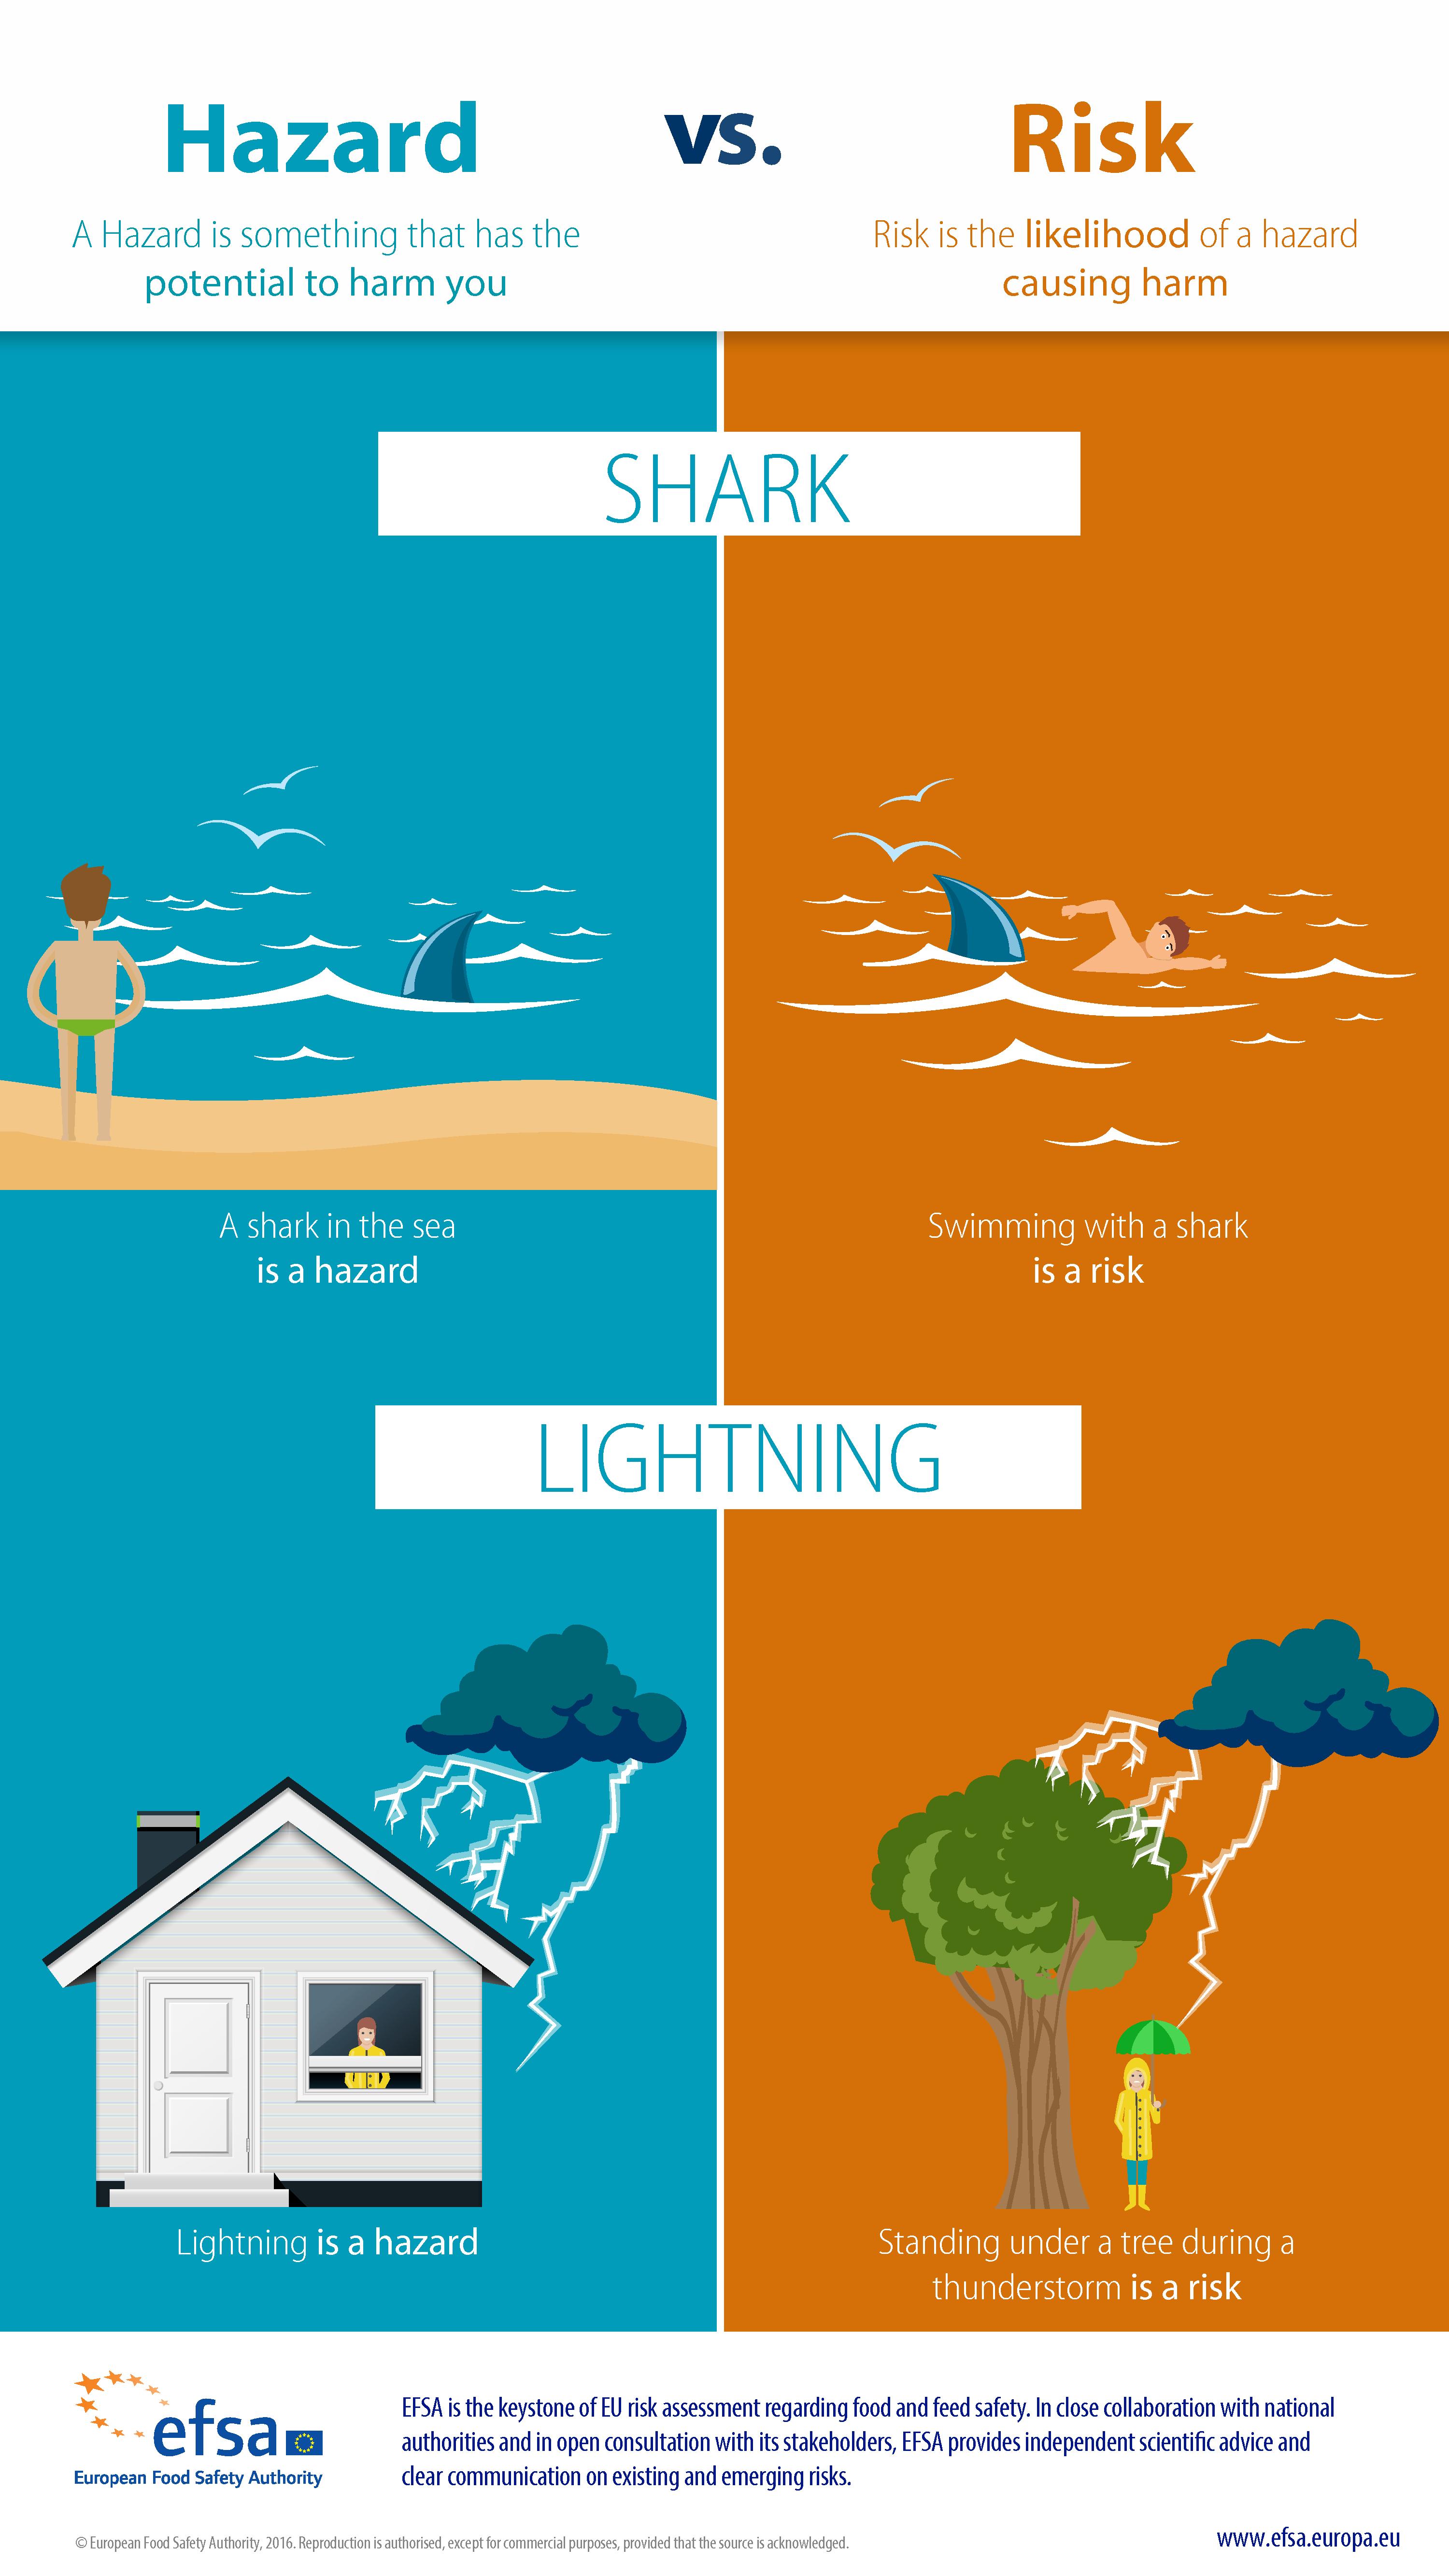 Tornado Nonfiction Article and Activity Education